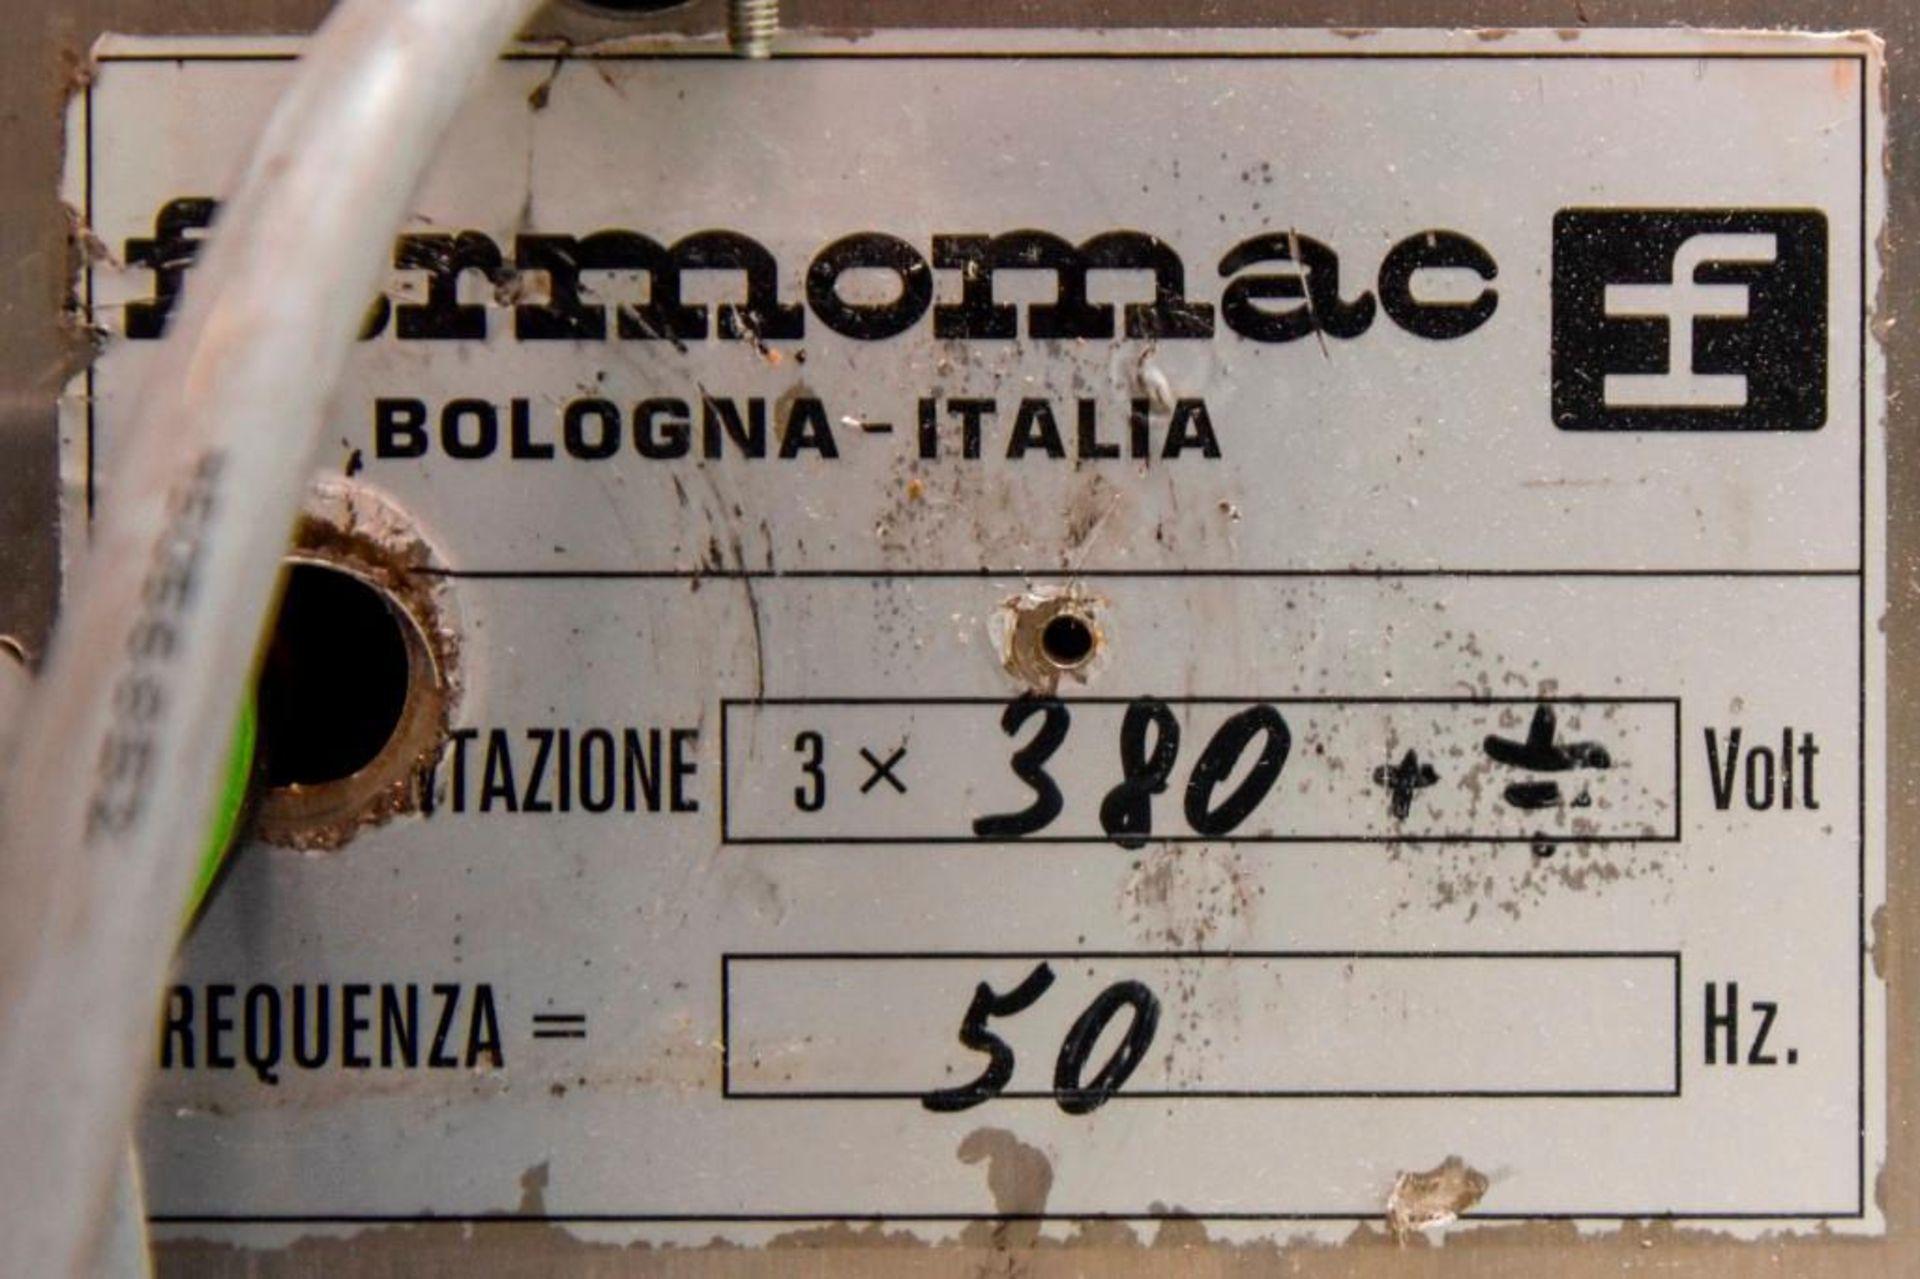 Farmomac Model 47 Monoblock Filler and Capper - Image 25 of 30